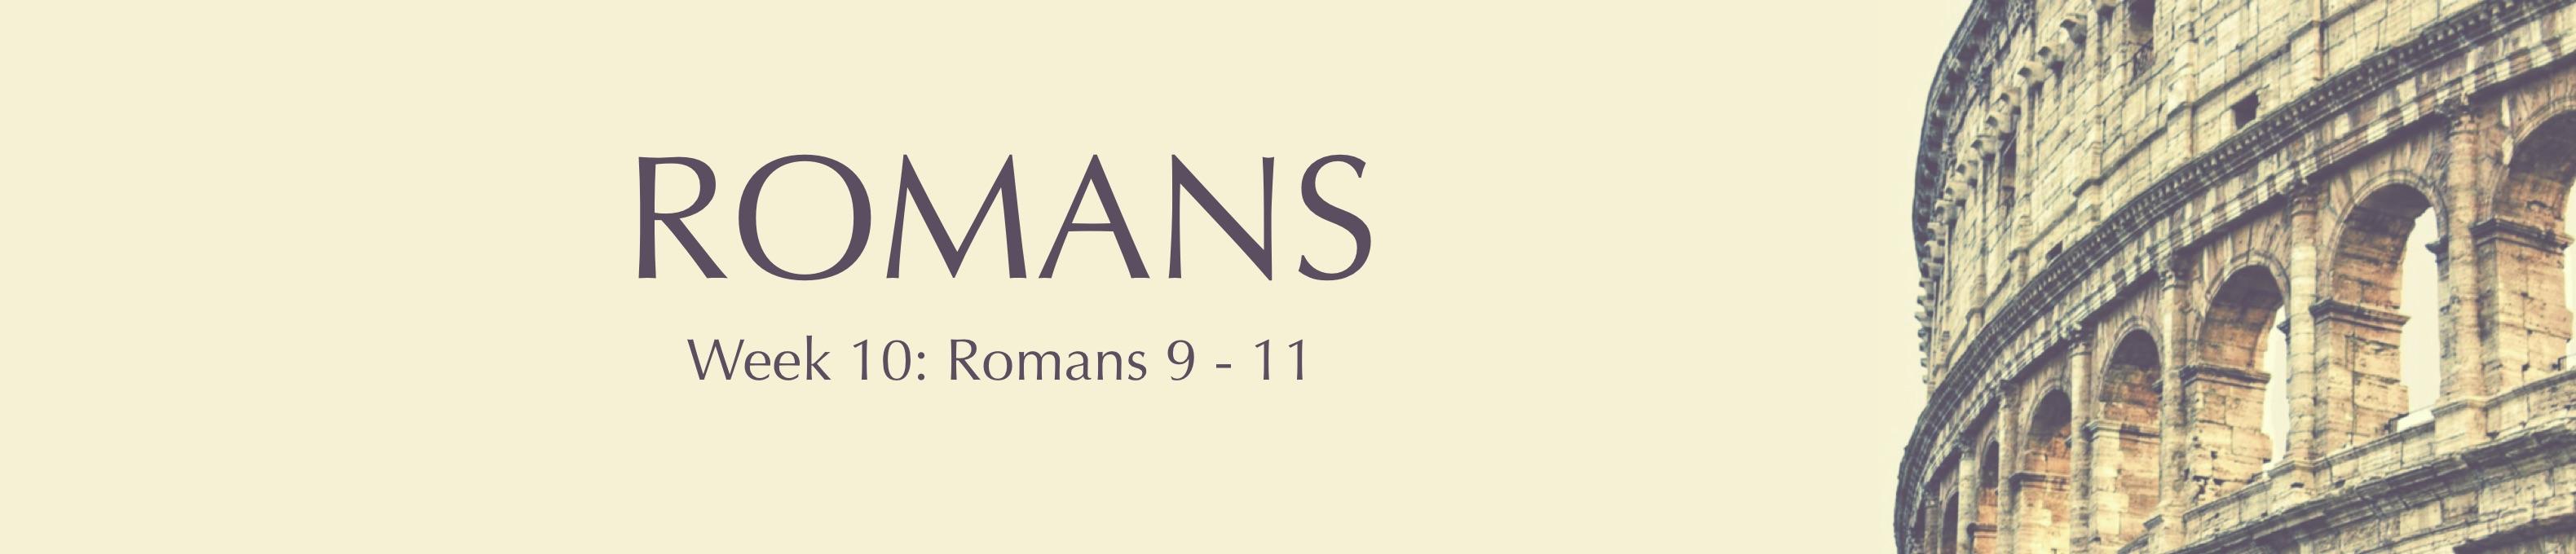 10 Week 10 Romans Banner